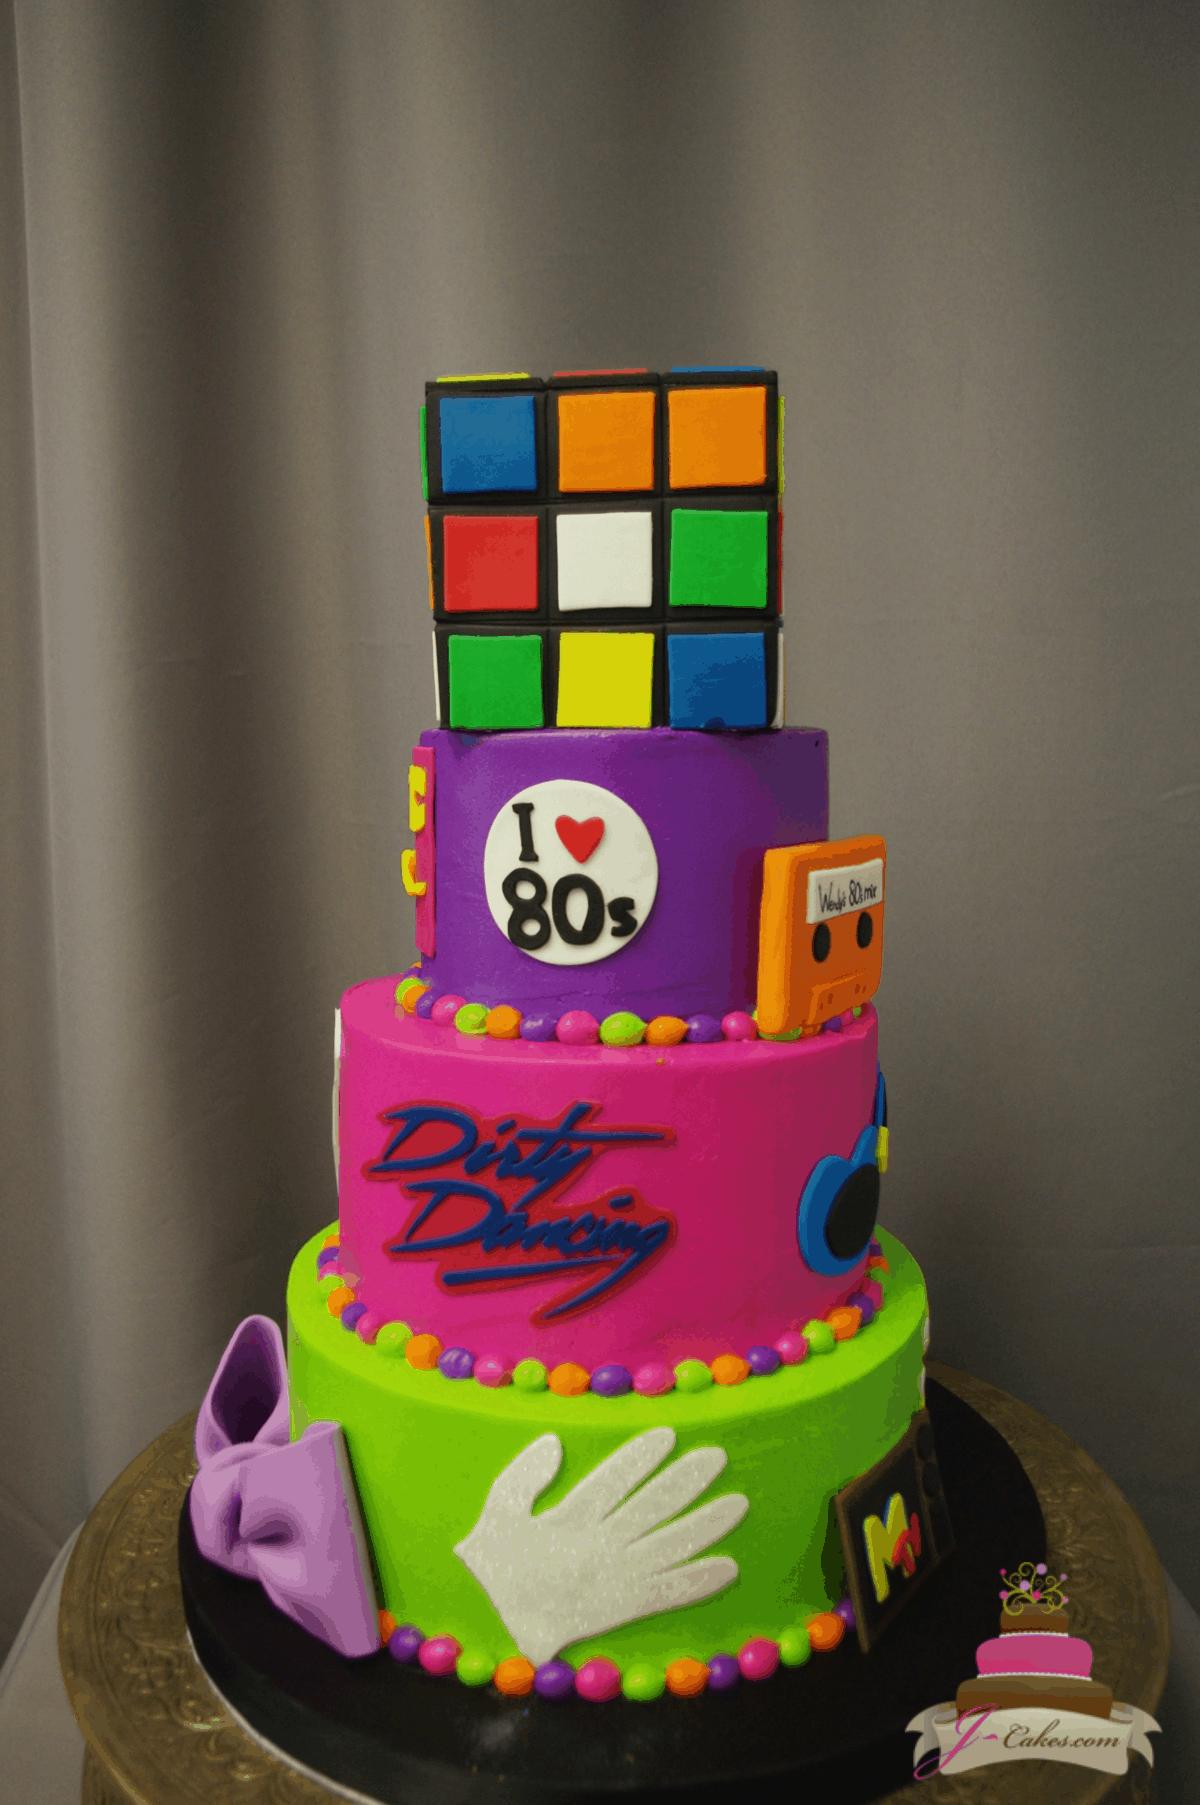 200 80s Birthday Cake